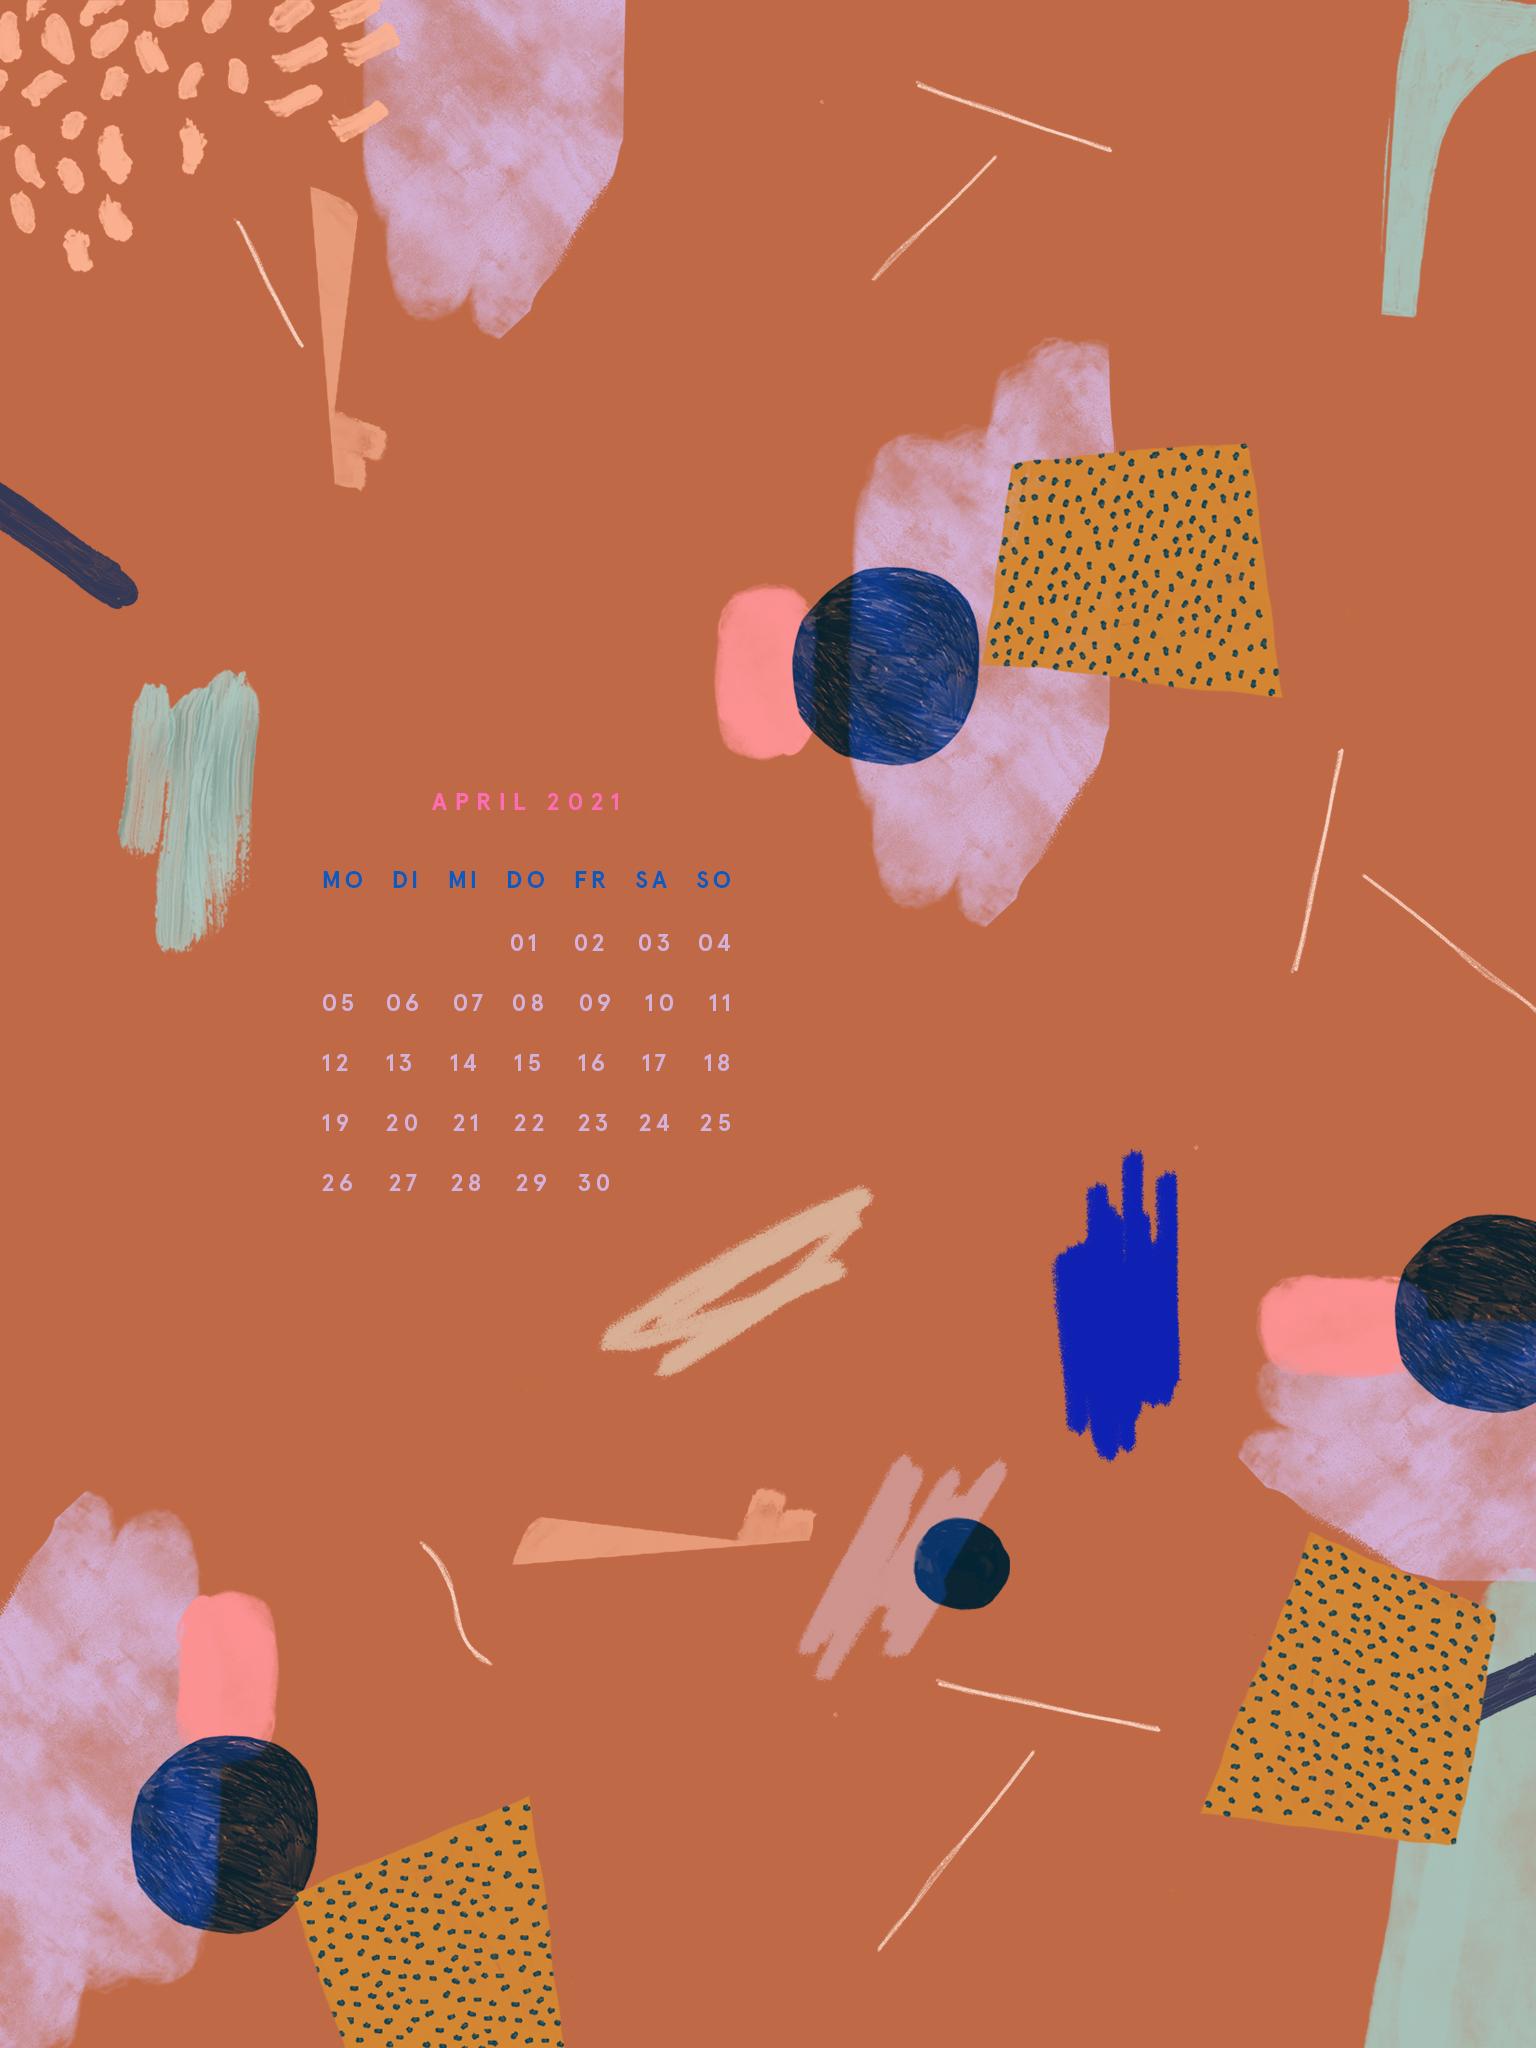 Free Desktop Wallpaper April 2021